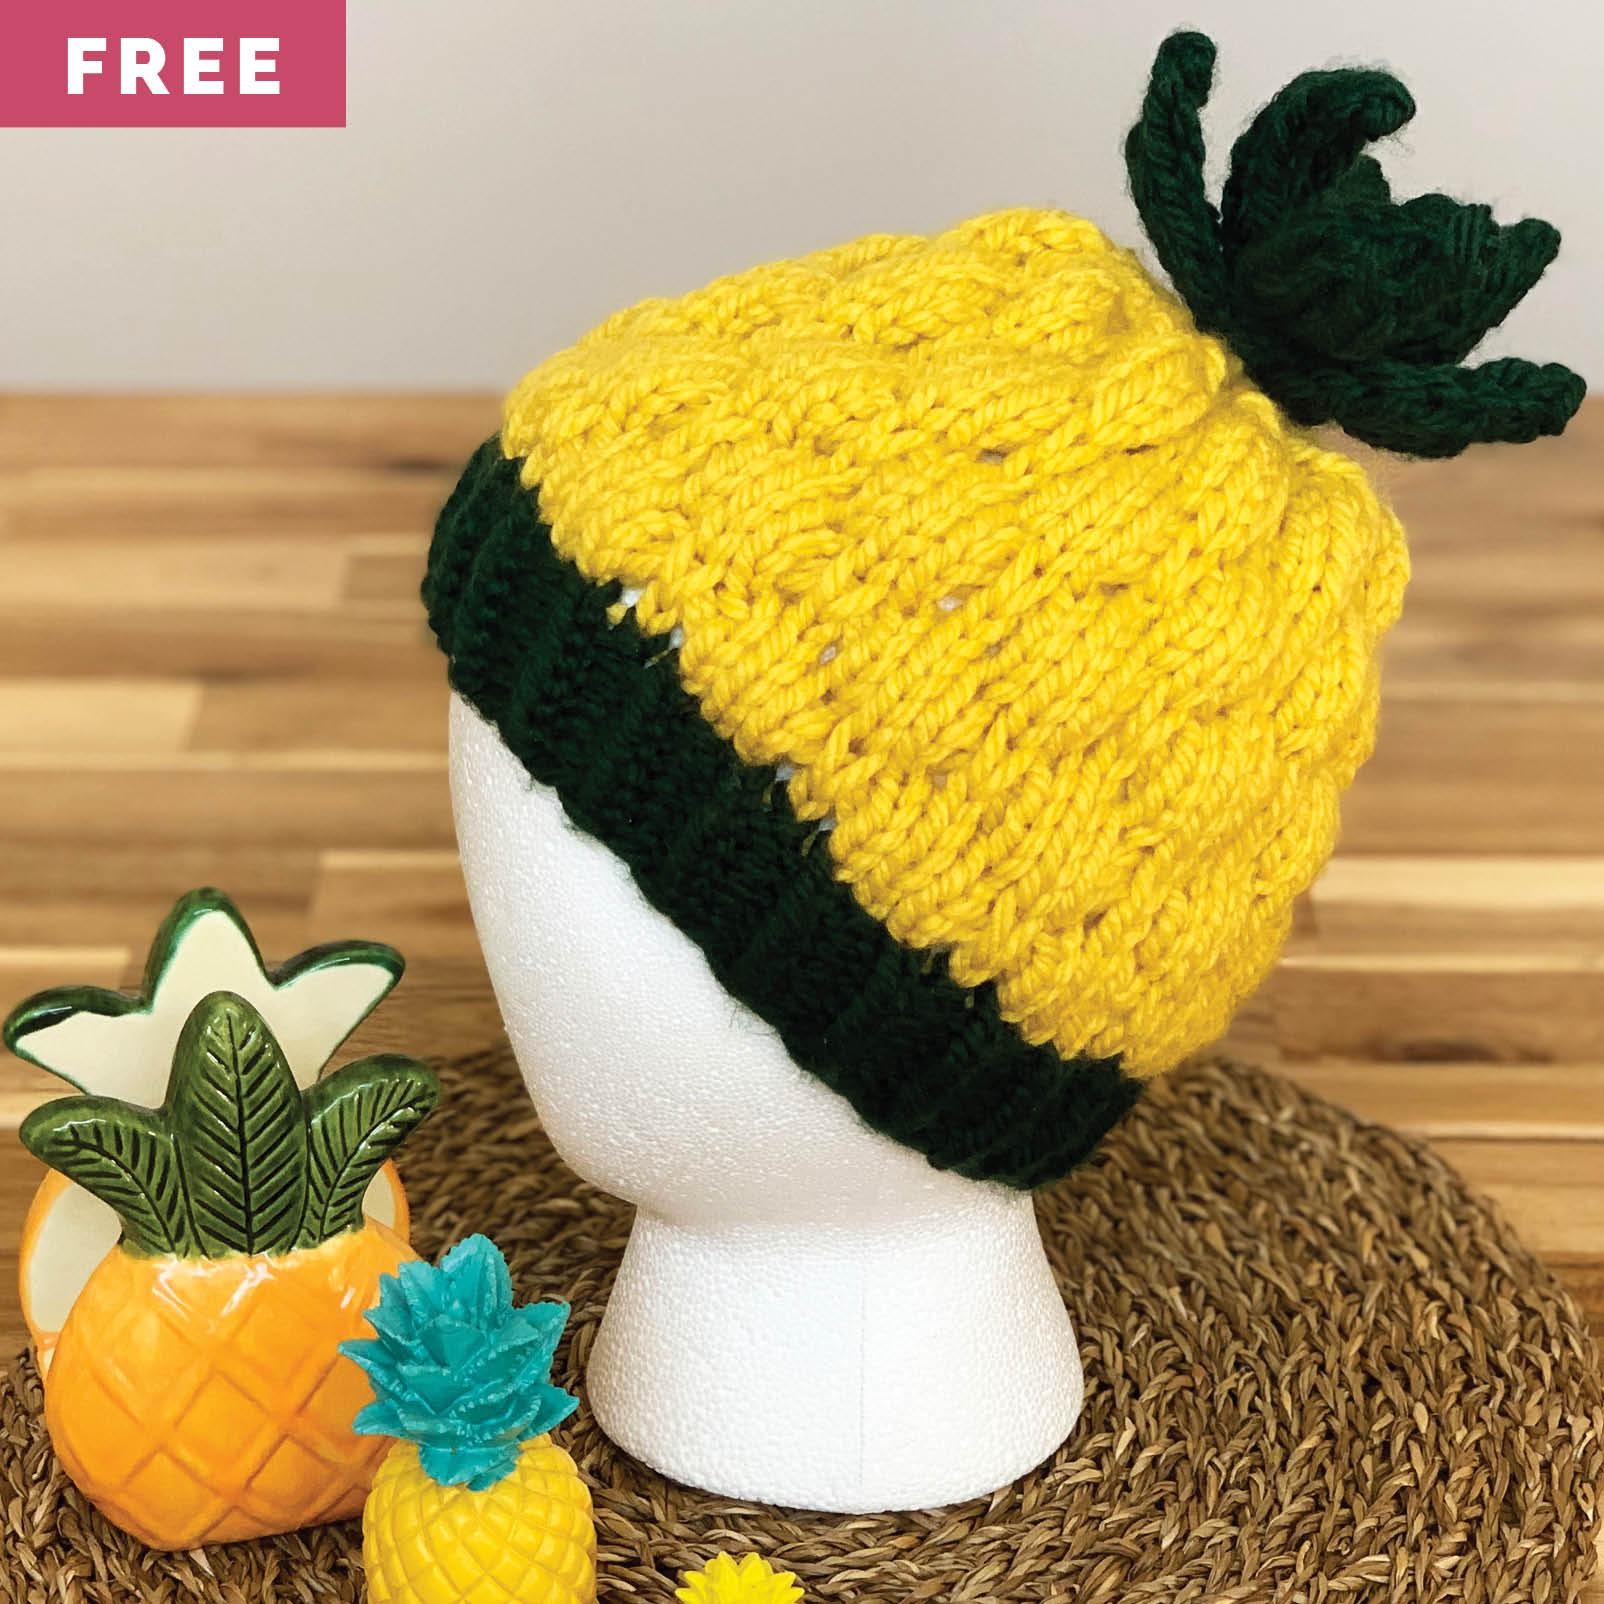 Free Knitting Pattern - Child's Pineapple Hat